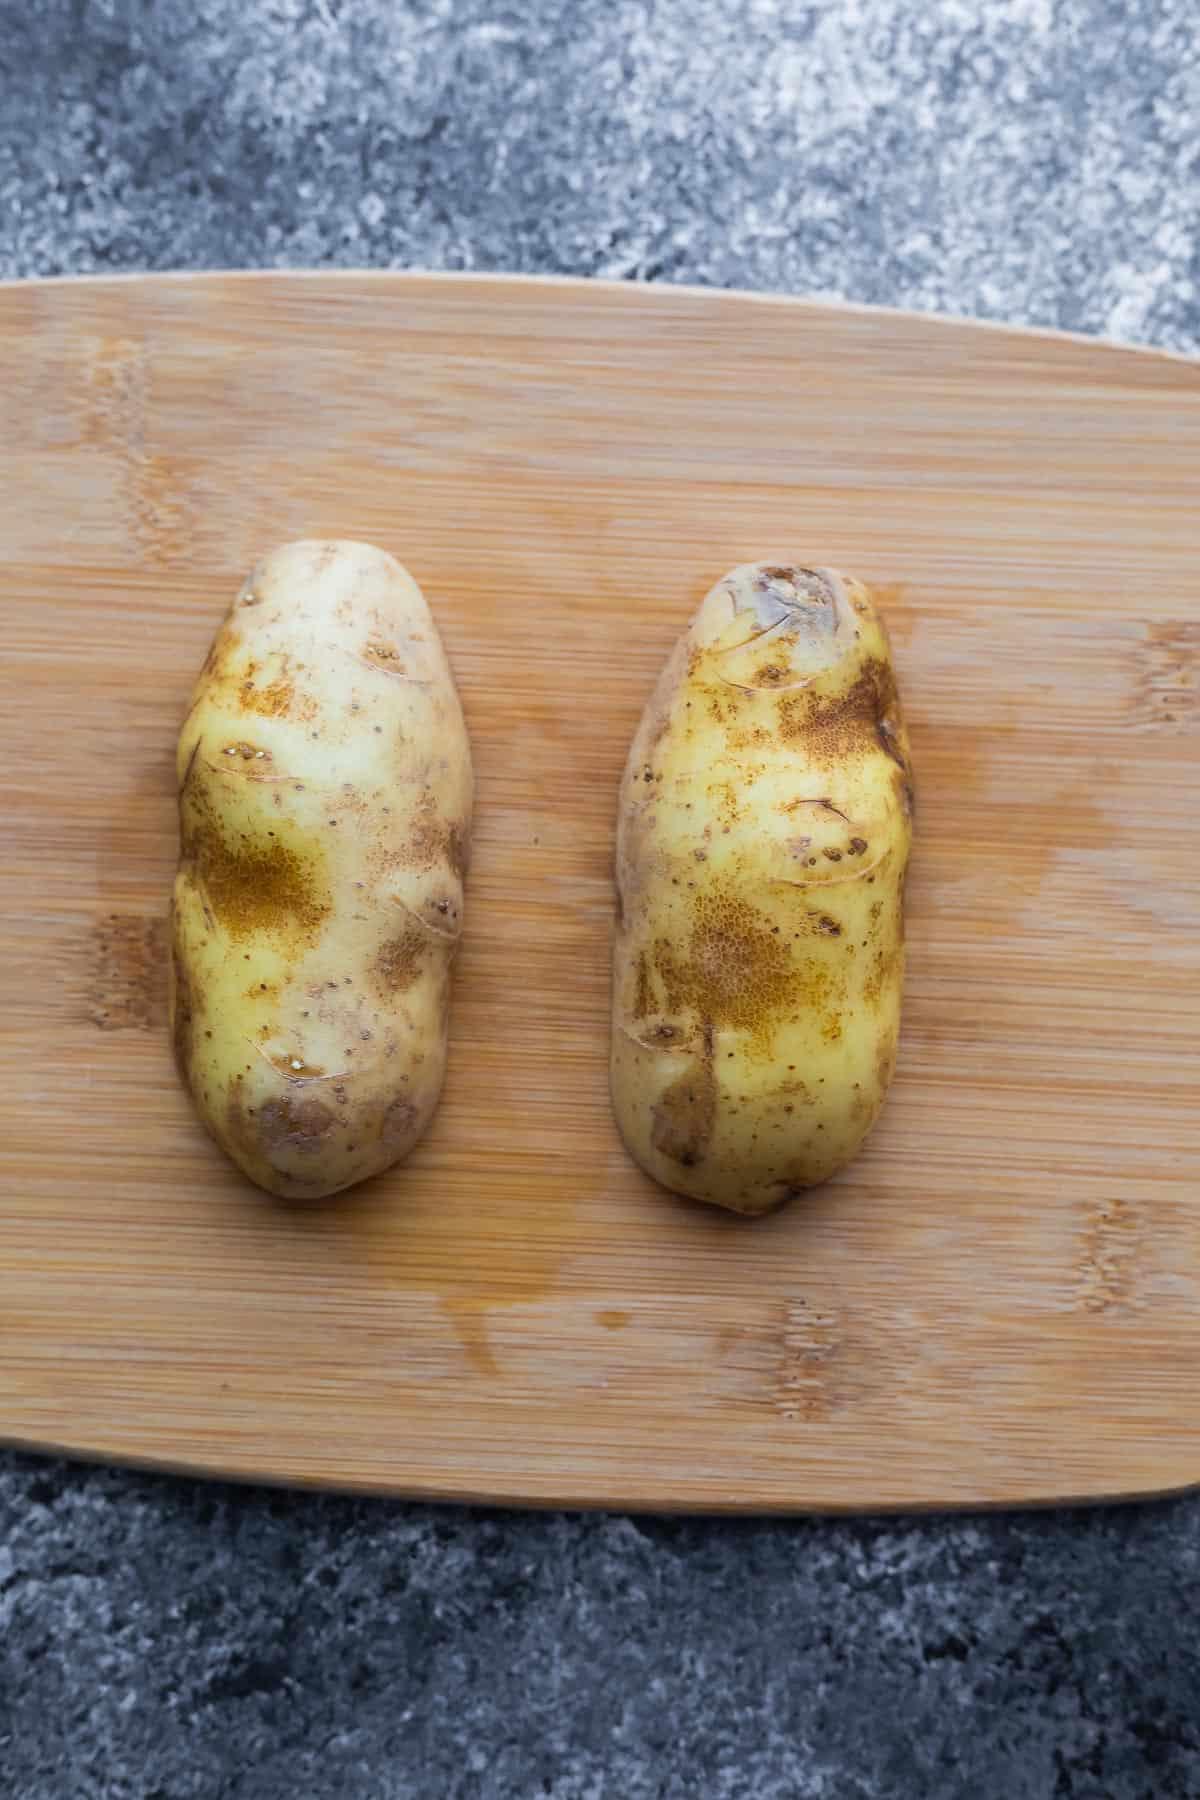 russet potato cut in half (cut sides down) on cutting board